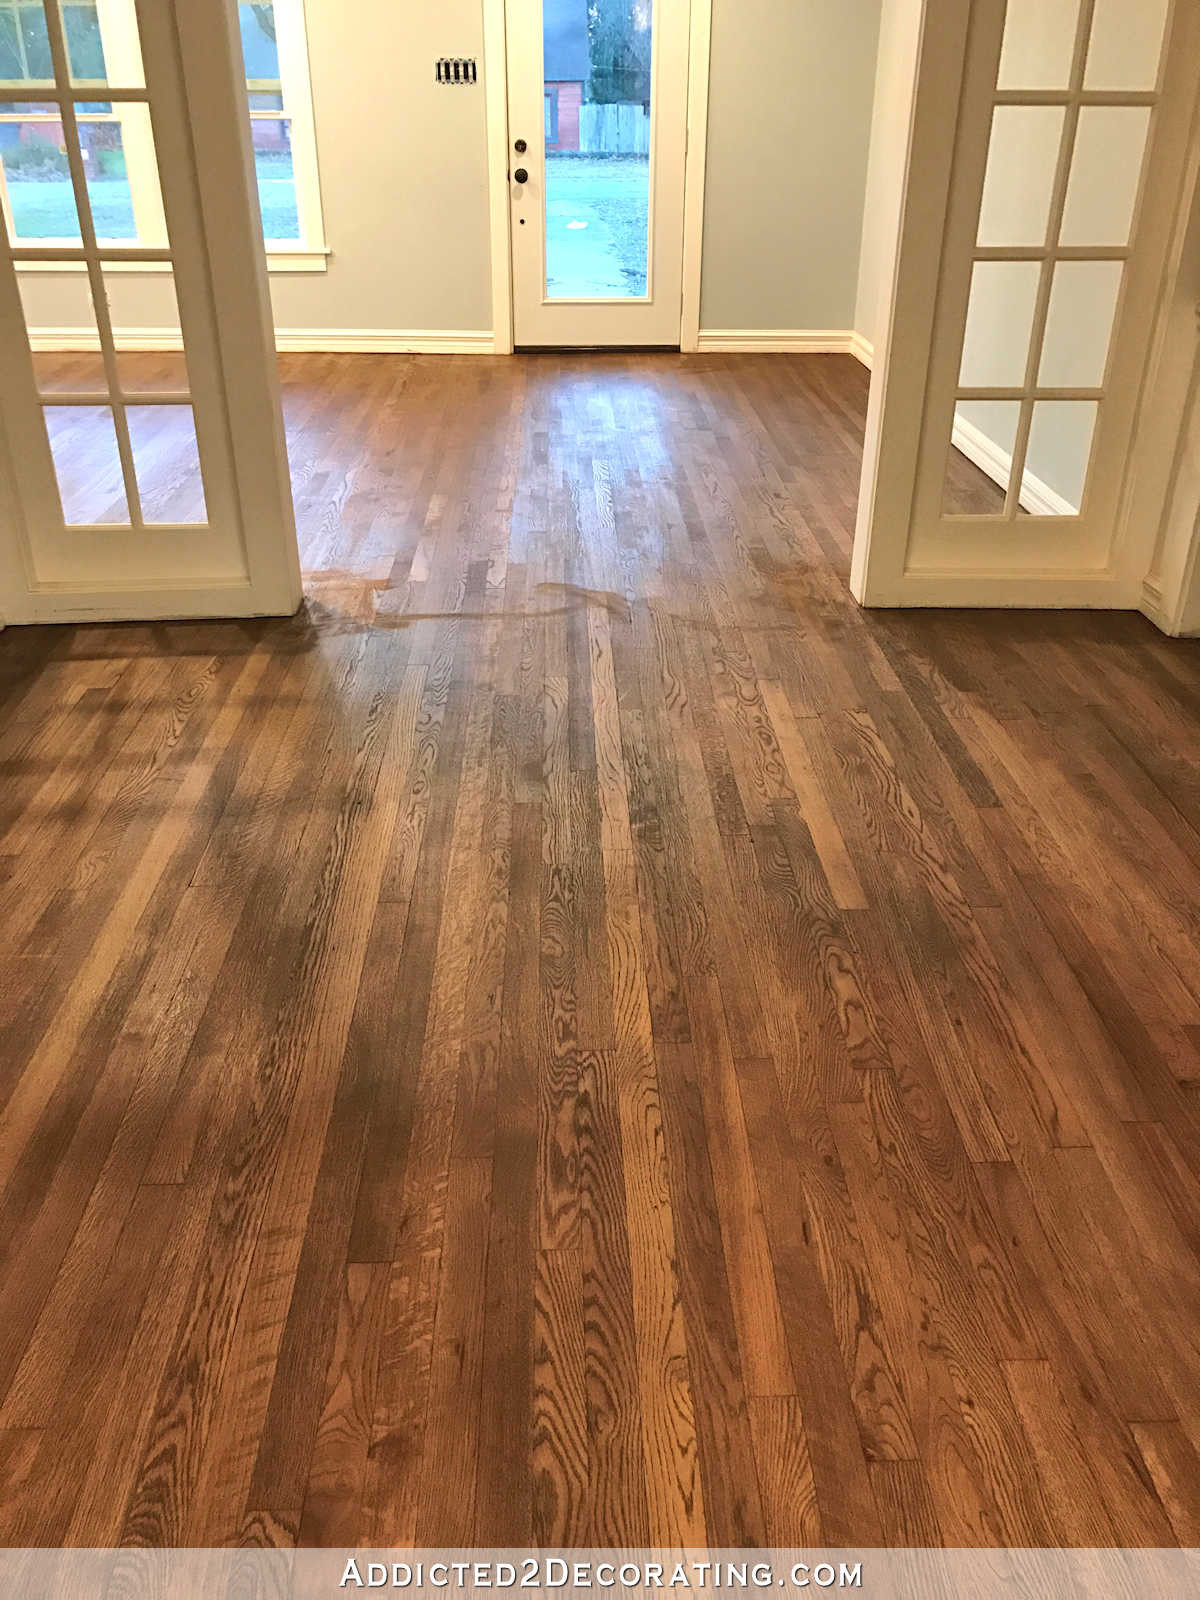 hardwood floor installation process of adventures in staining my red oak hardwood floors products process with regard to staining red oak hardwood floors 9 stain on entryway and music room floors